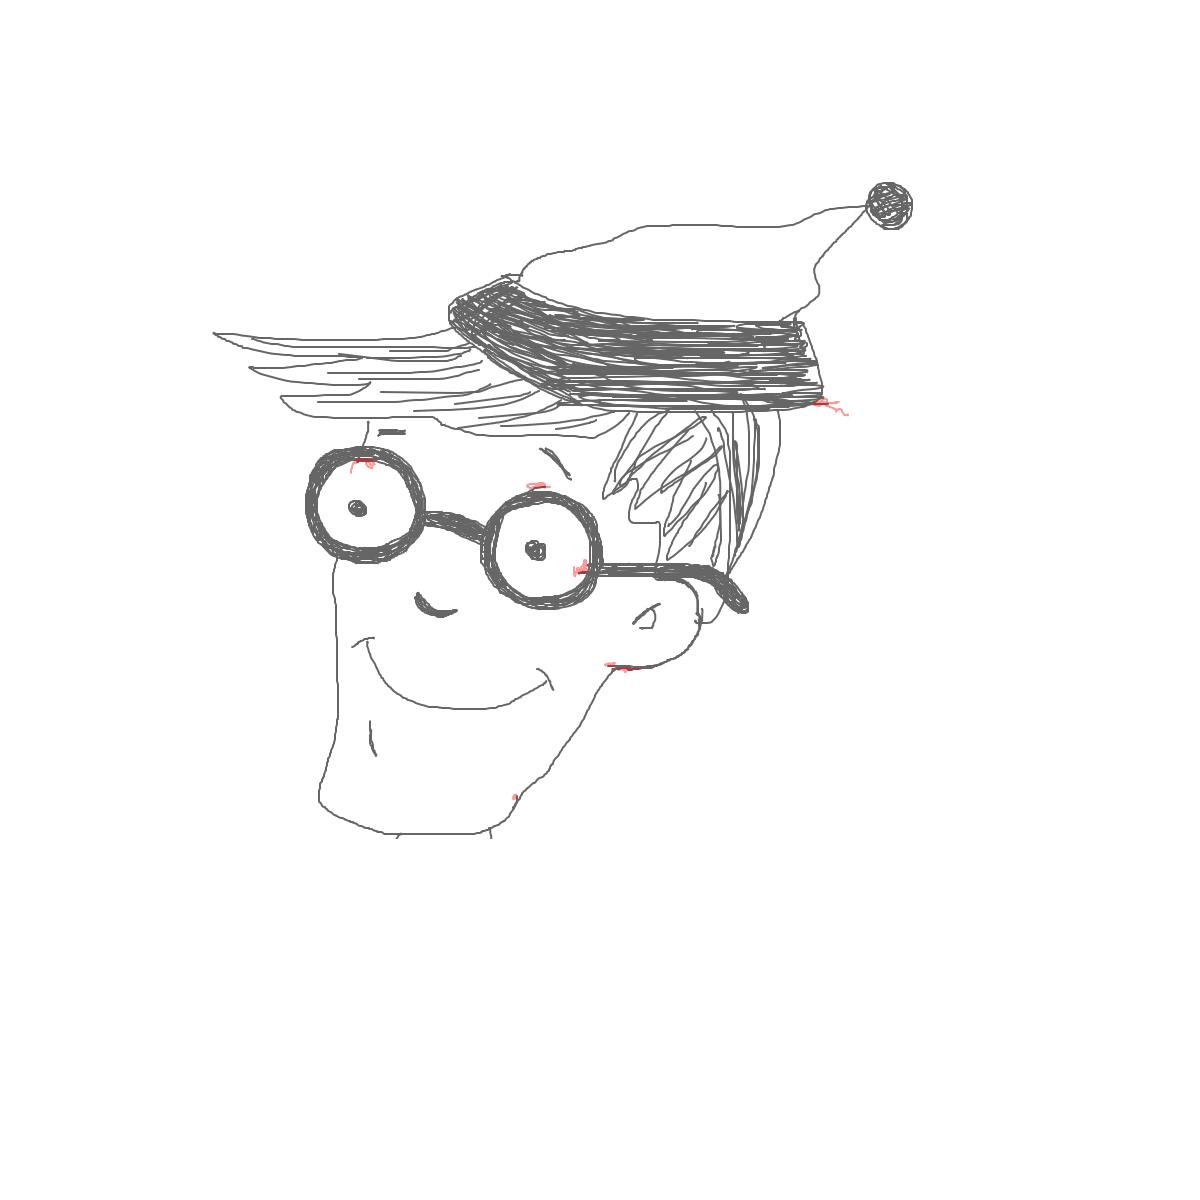 BAAAM drawing#5844 lat:41.6676750183105500lng: -0.8849810957908630